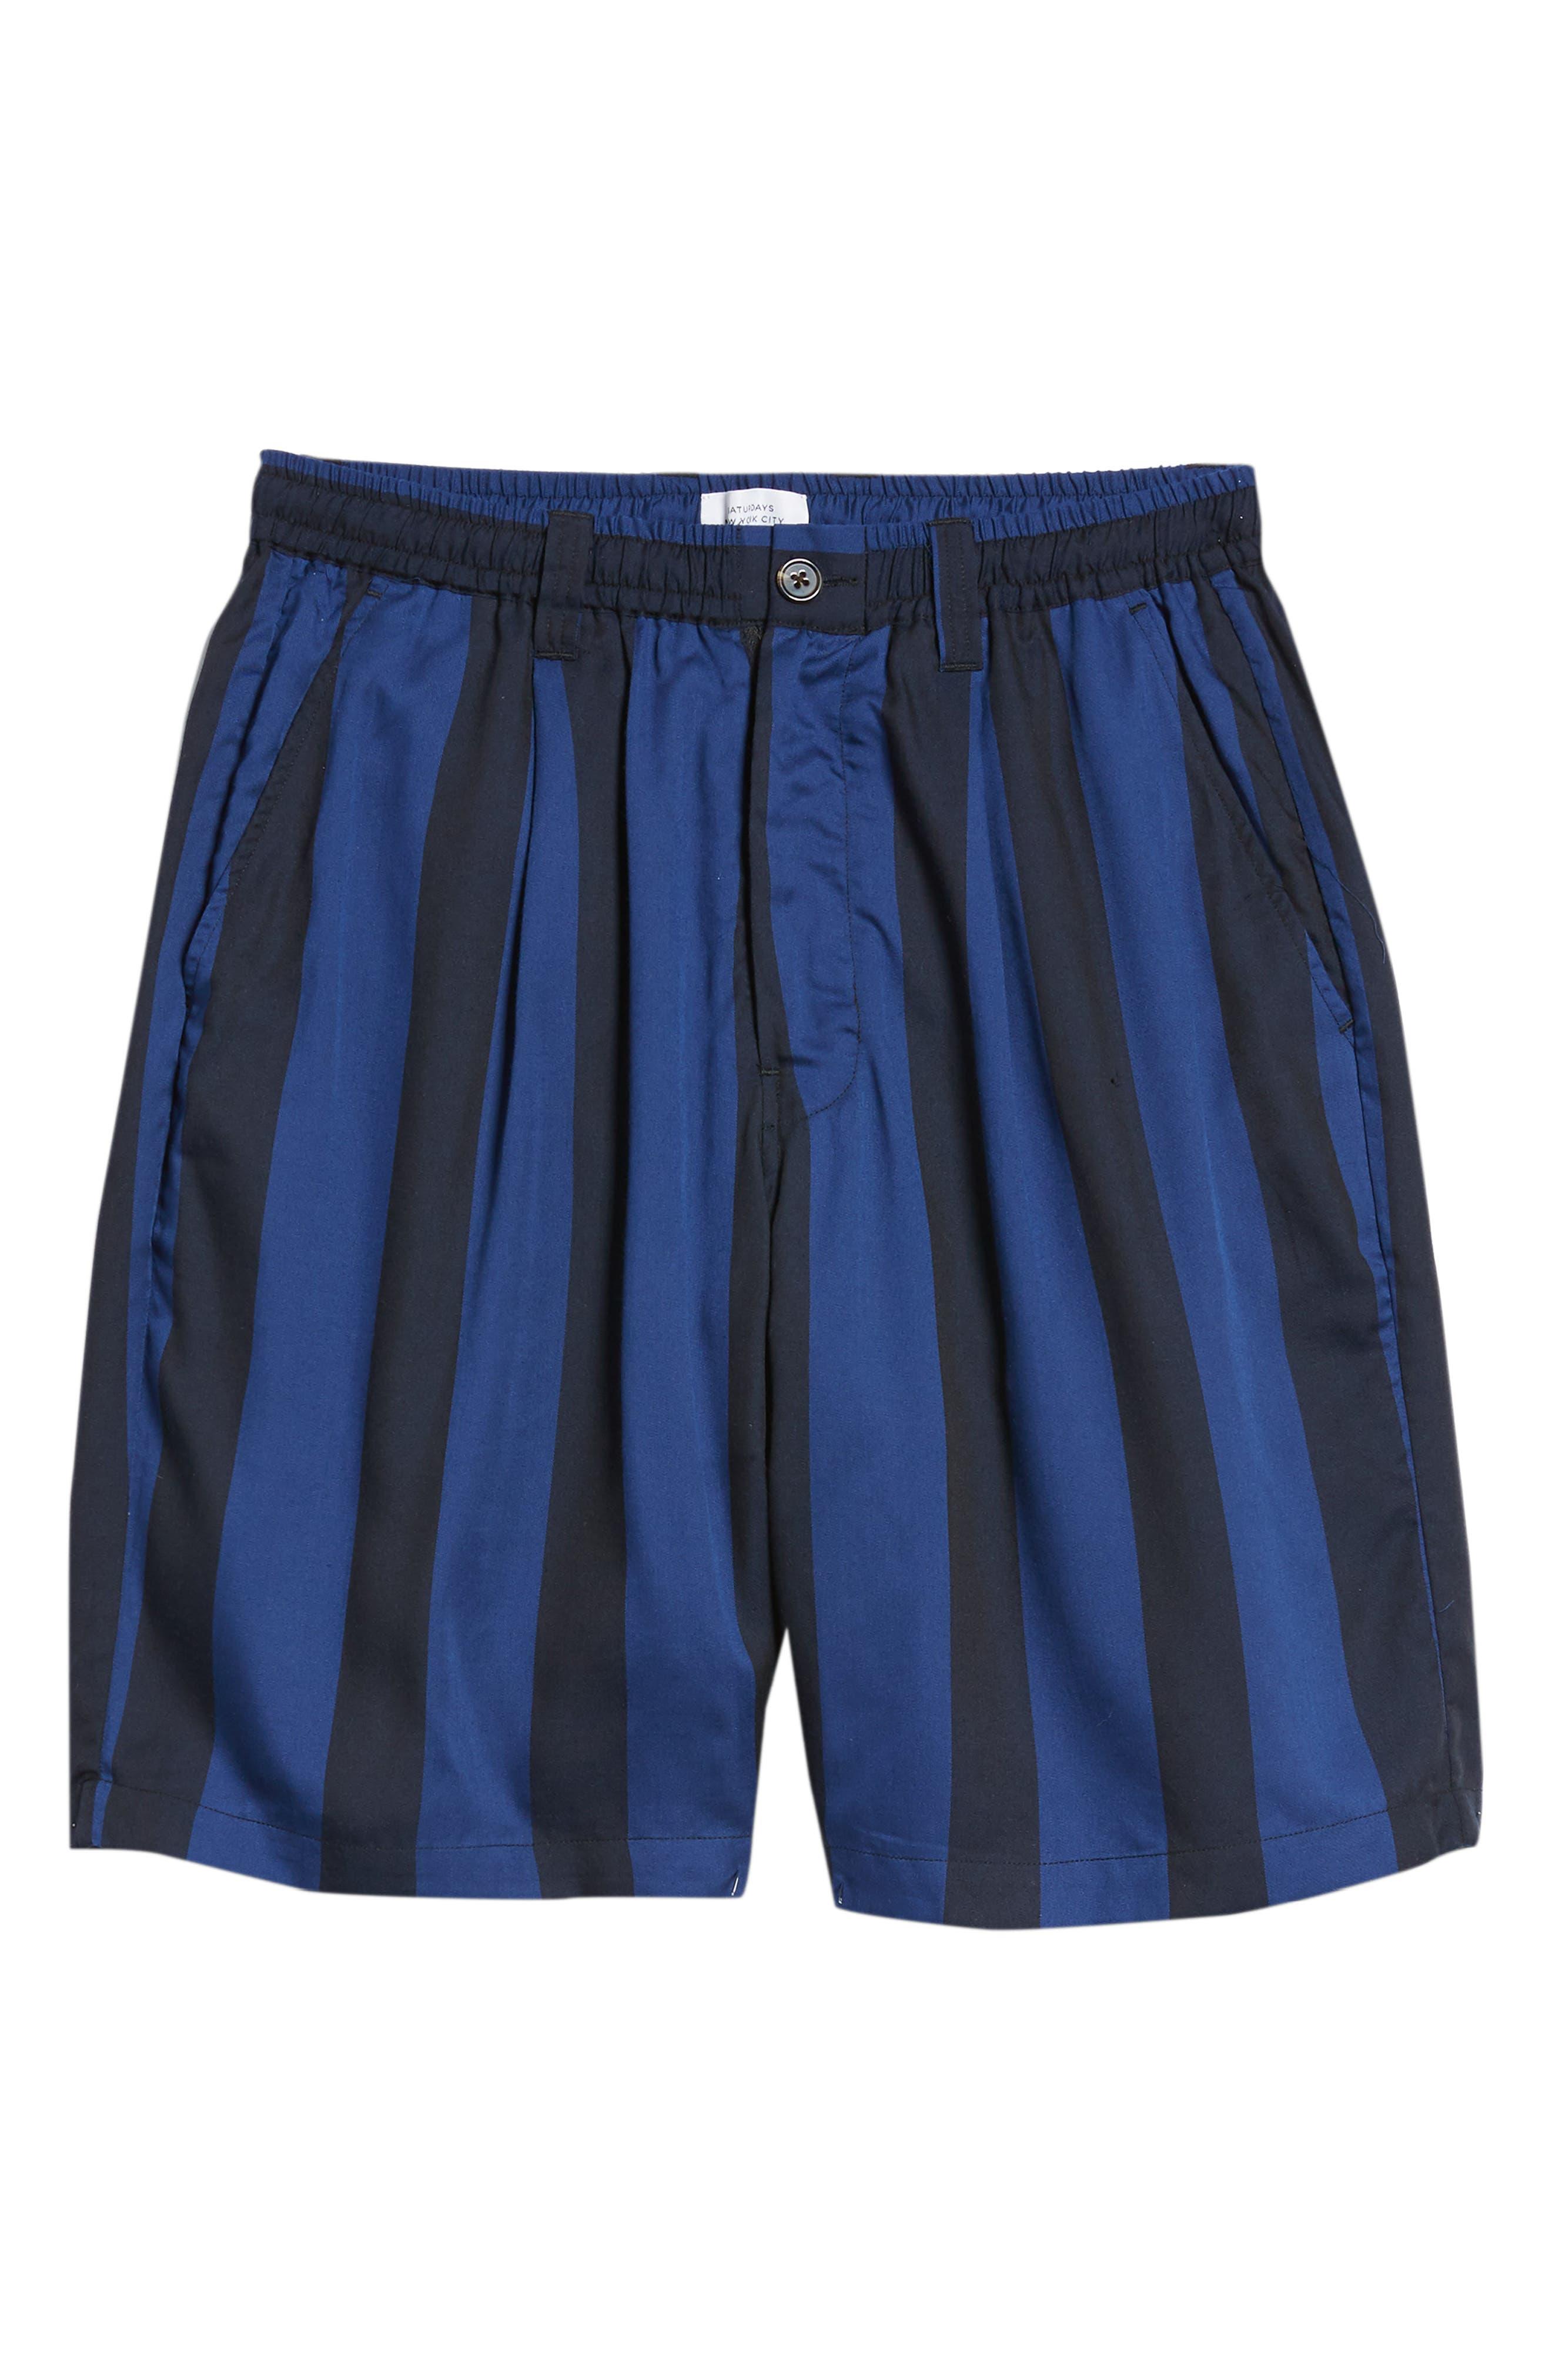 Keigo Broad Stripe Shorts,                             Alternate thumbnail 6, color,                             COBALT